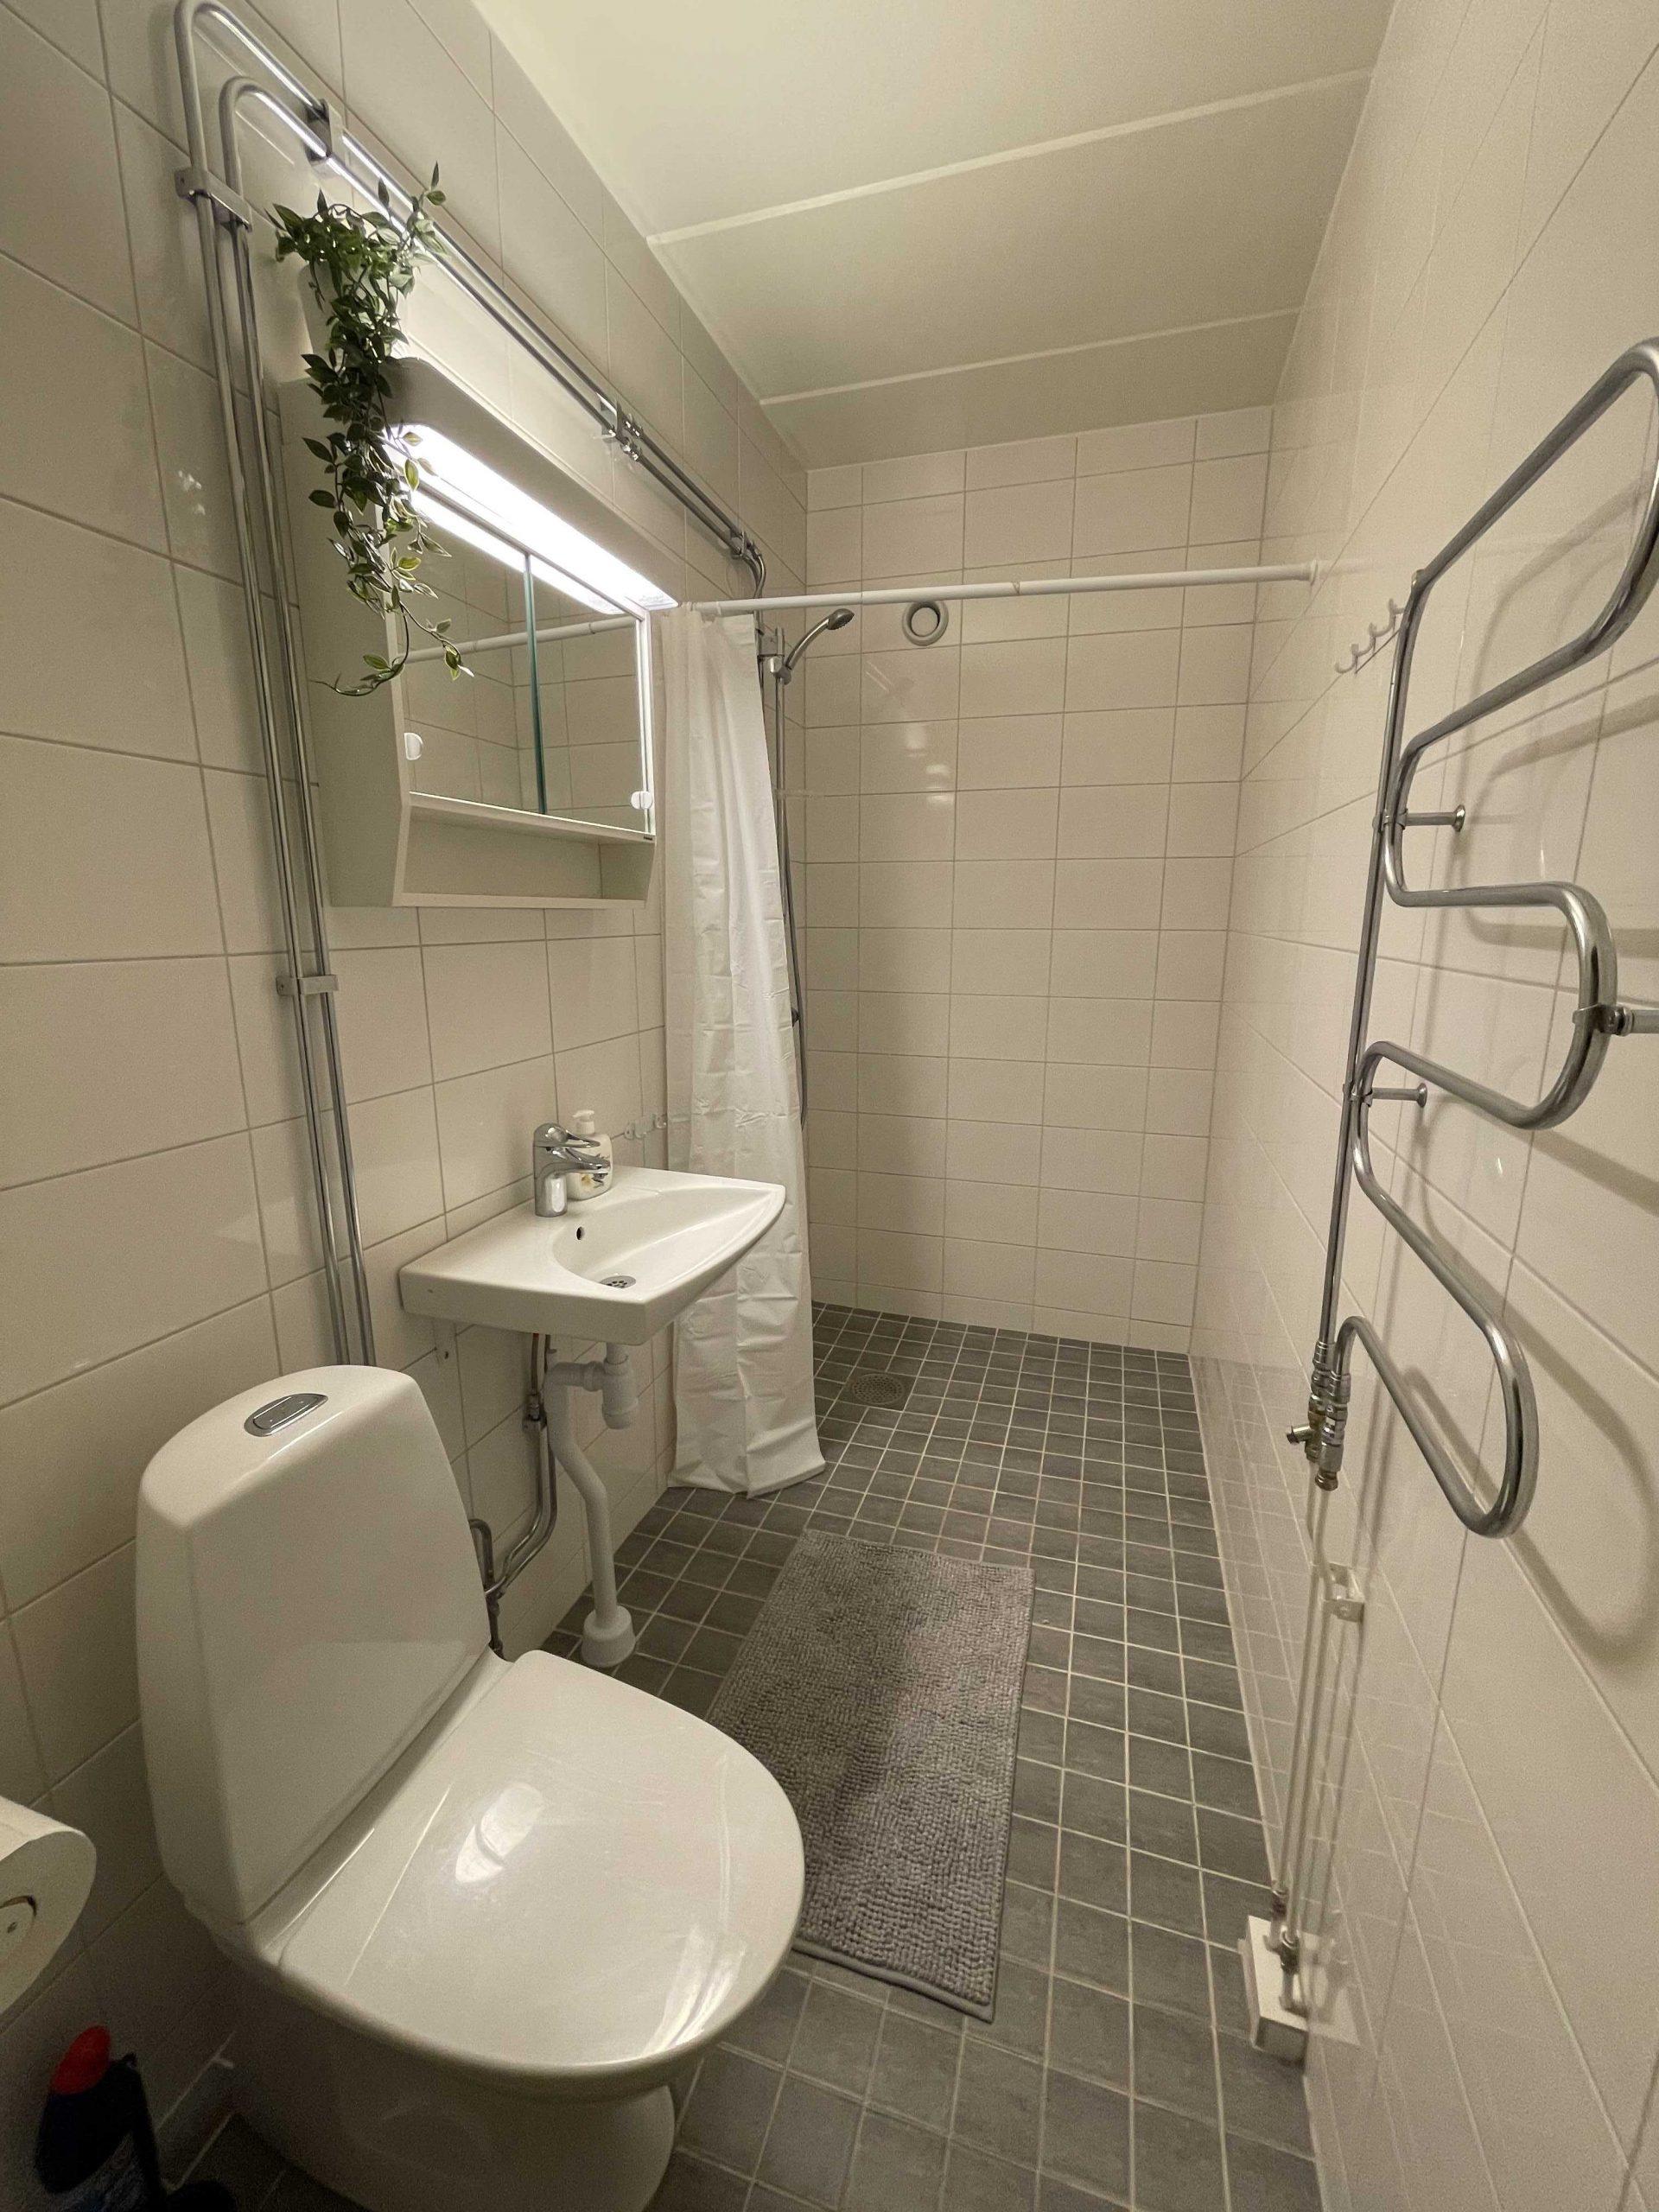 Stayeasy, Stayeasy apartemnts, Business accommodation, Furnished apartmnet